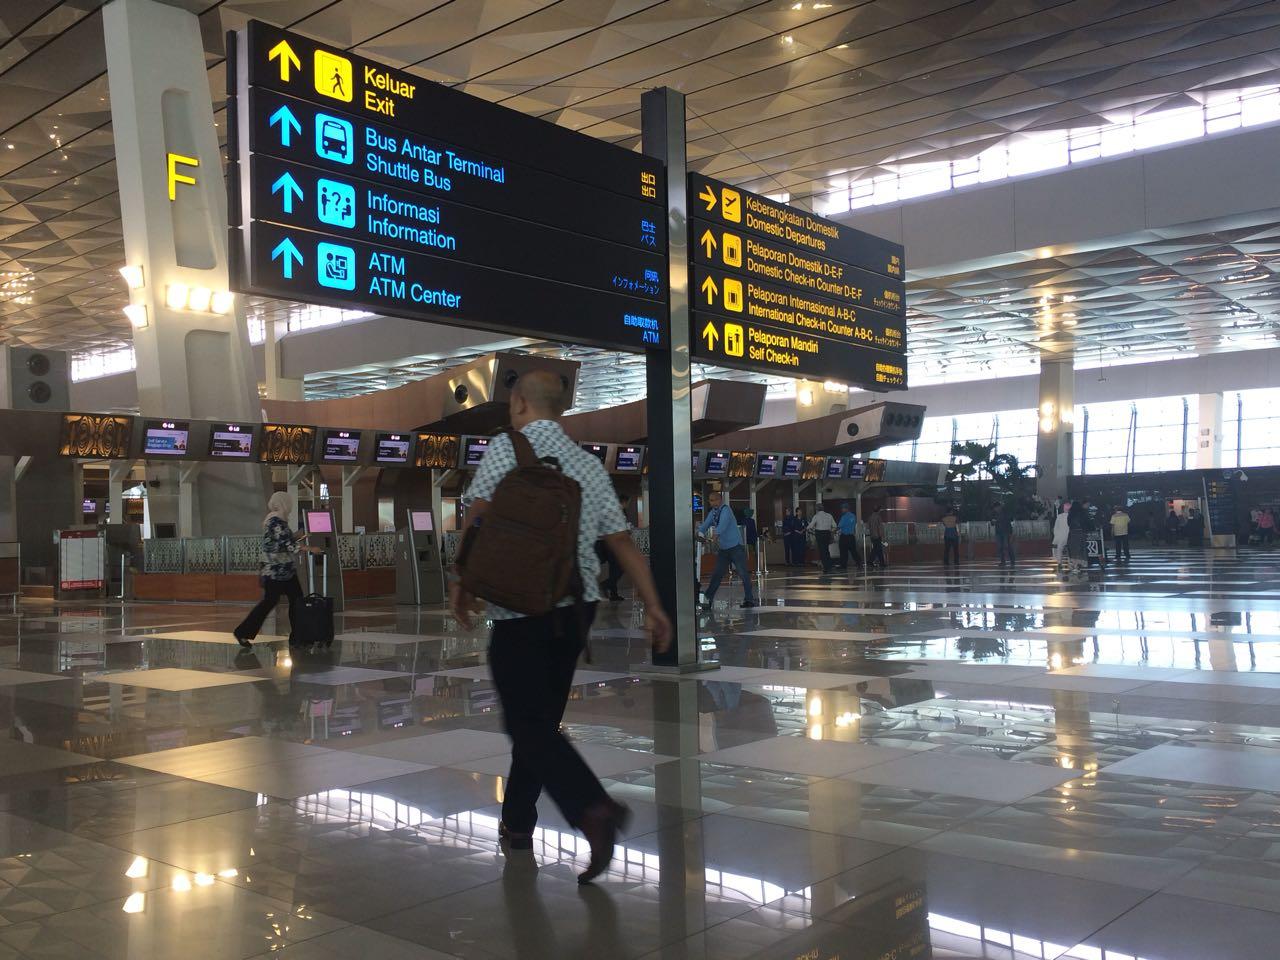 https: img-z.okeinfo.net content 2018 04 16 320 1887108 sambut-114-pesawat-proyek-runway-3-bandara-soetta-selesai-2019-dFFvHPkl4k.jpg